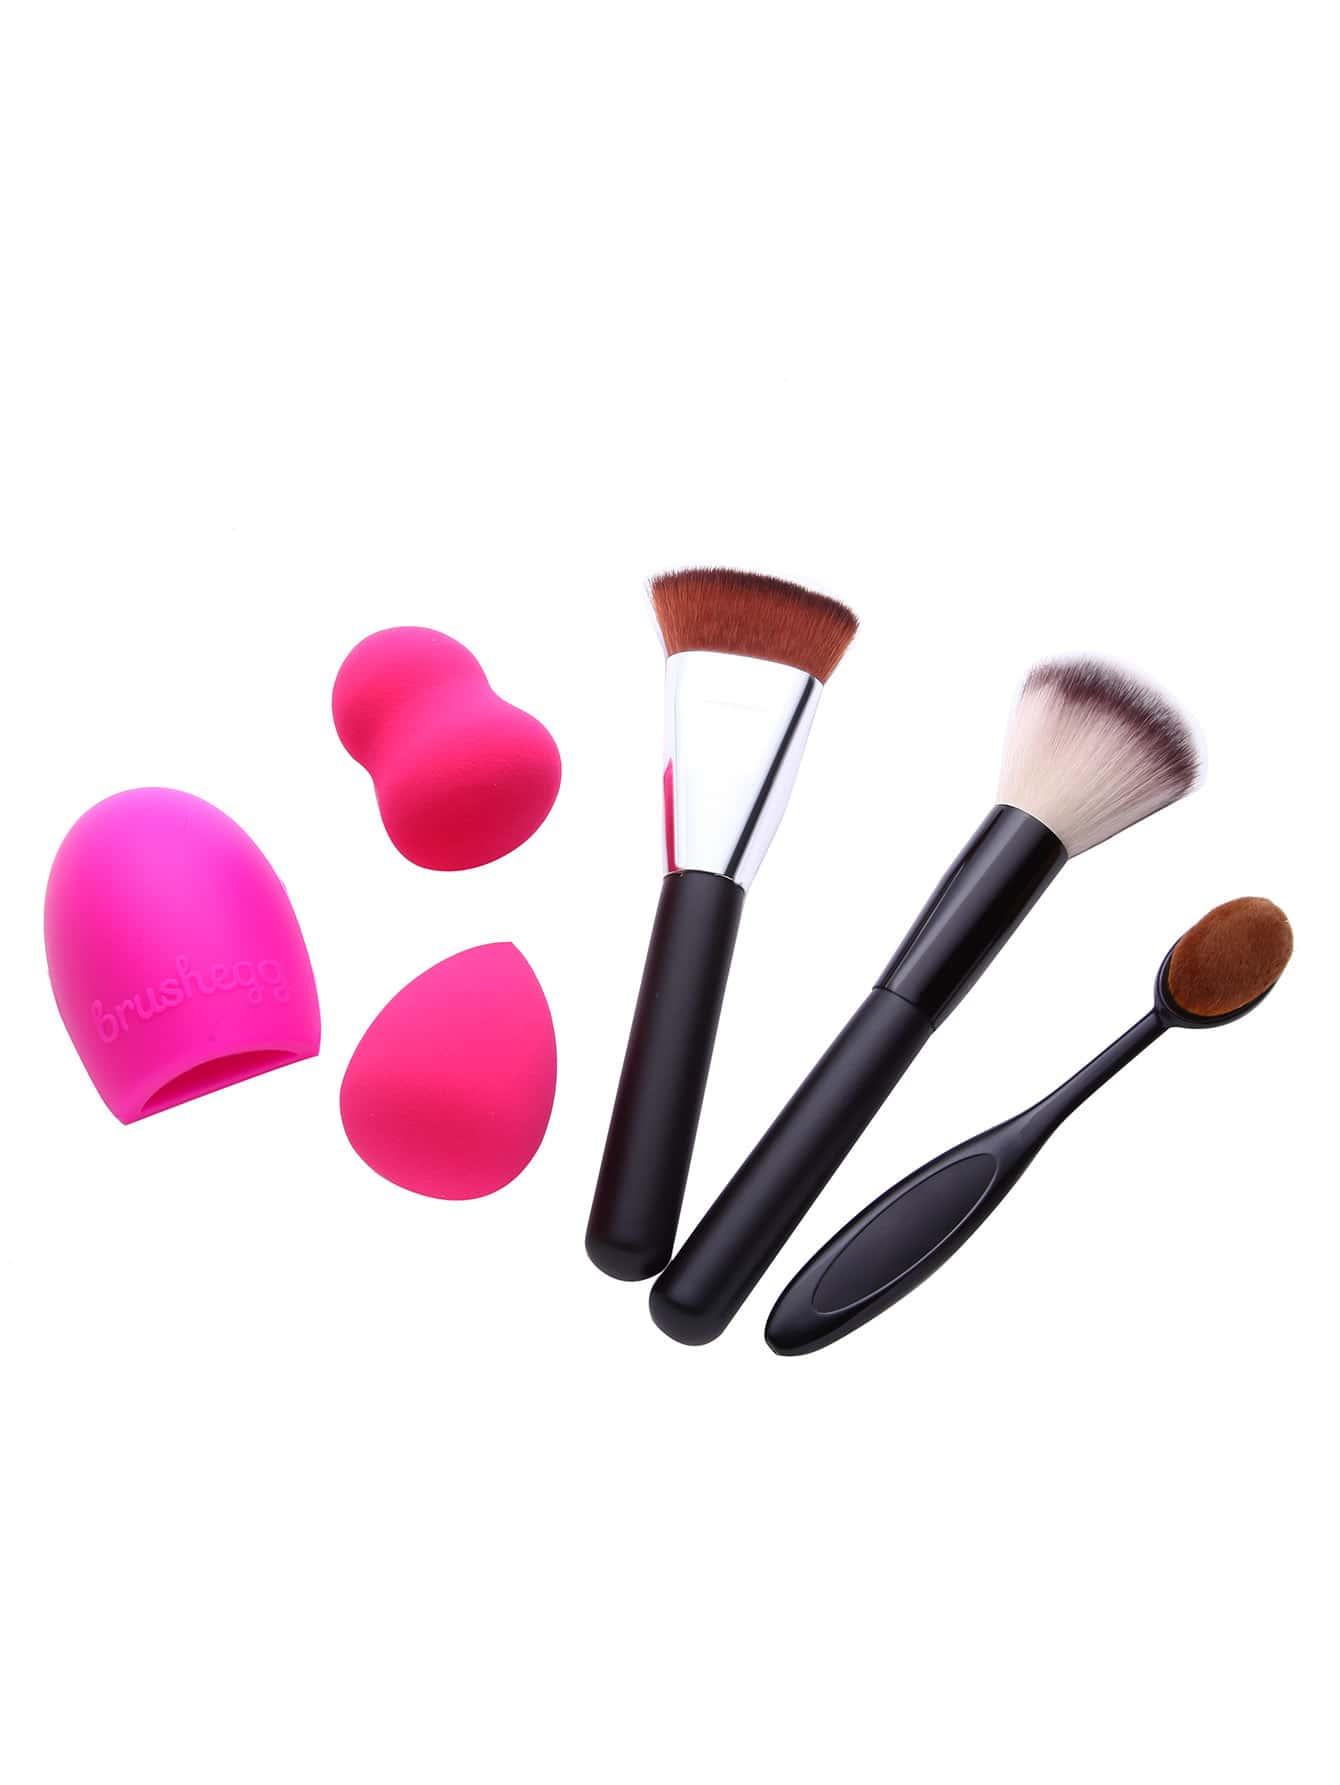 Фото 6PCS Brush Cleaning Brush Powder Puff Makeup Tool Set. Купить с доставкой